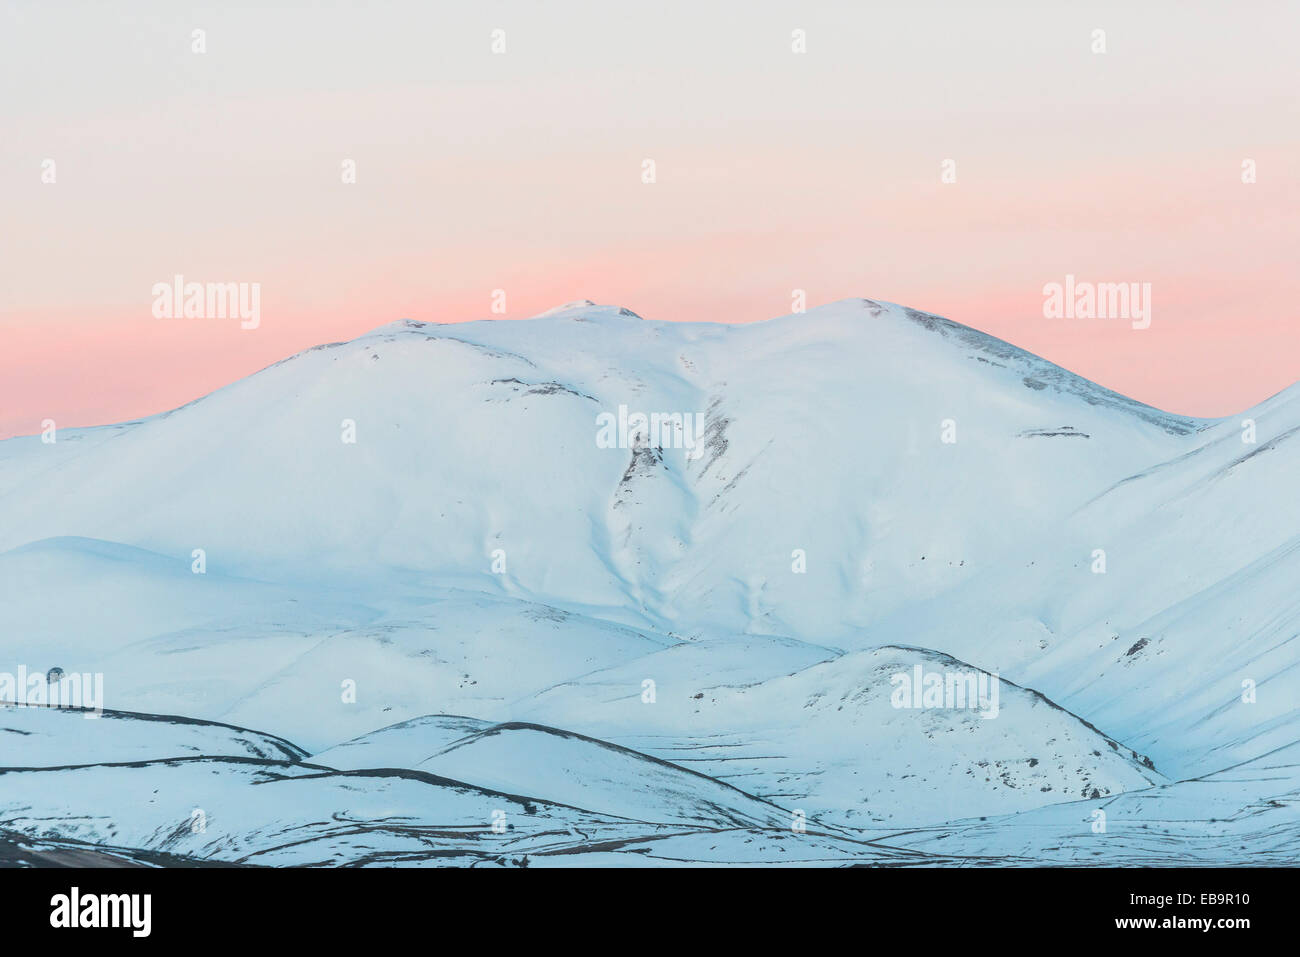 Sunset in winter, Monti Sibillini National Park, Castelluccio di Norcia, Umbria, Italy - Stock Image